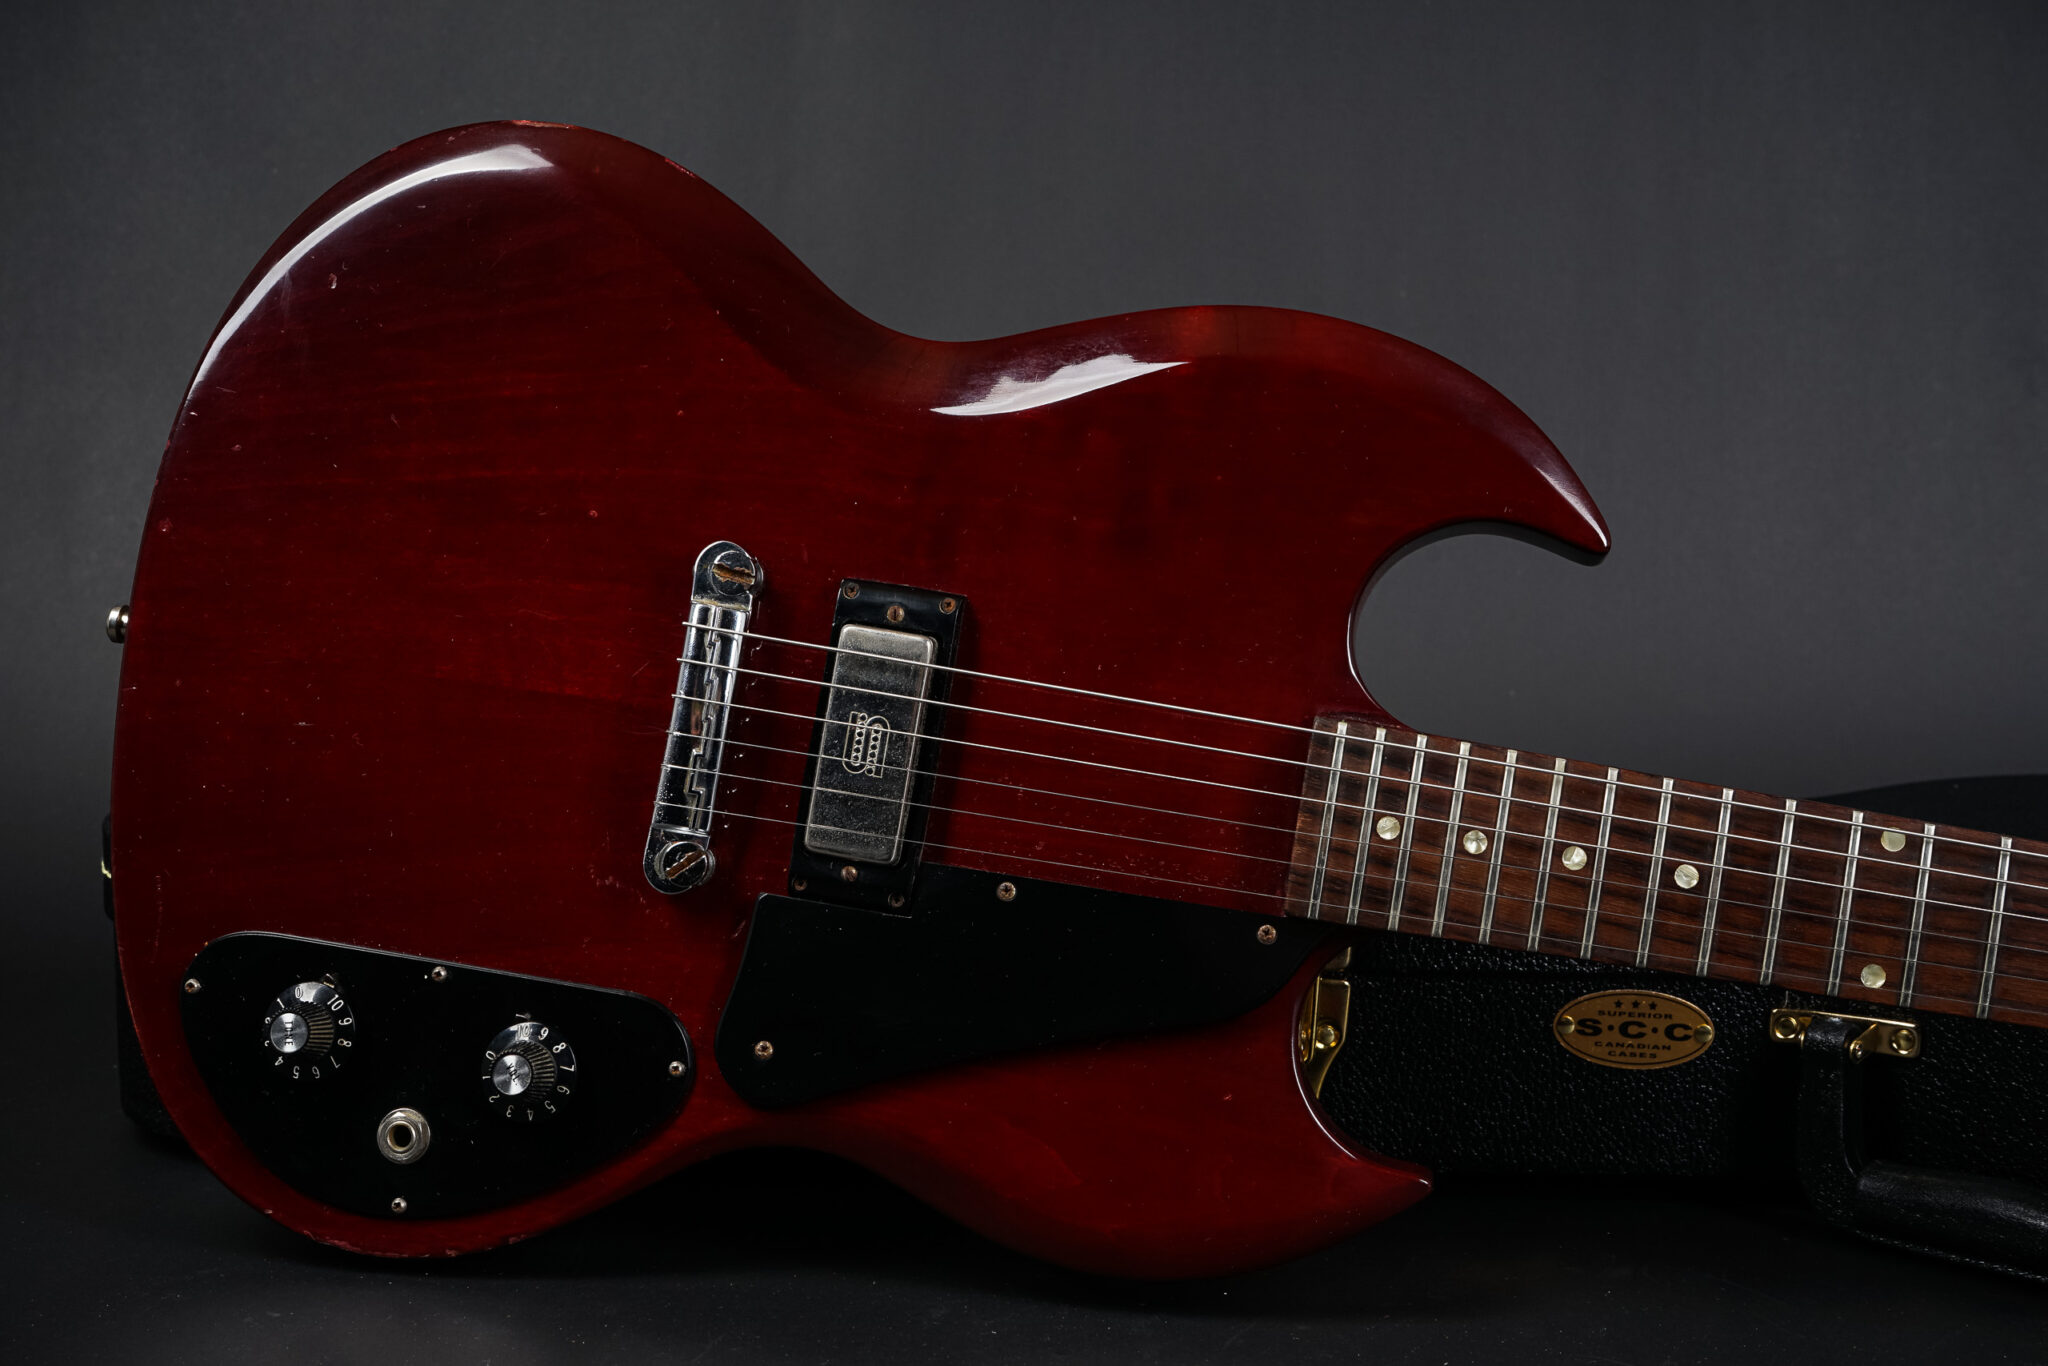 https://guitarpoint.de/app/uploads/products/1972-gibson-sg-1-cherry/1972-Gibson-SG-1-691524-8-2048x1366.jpg